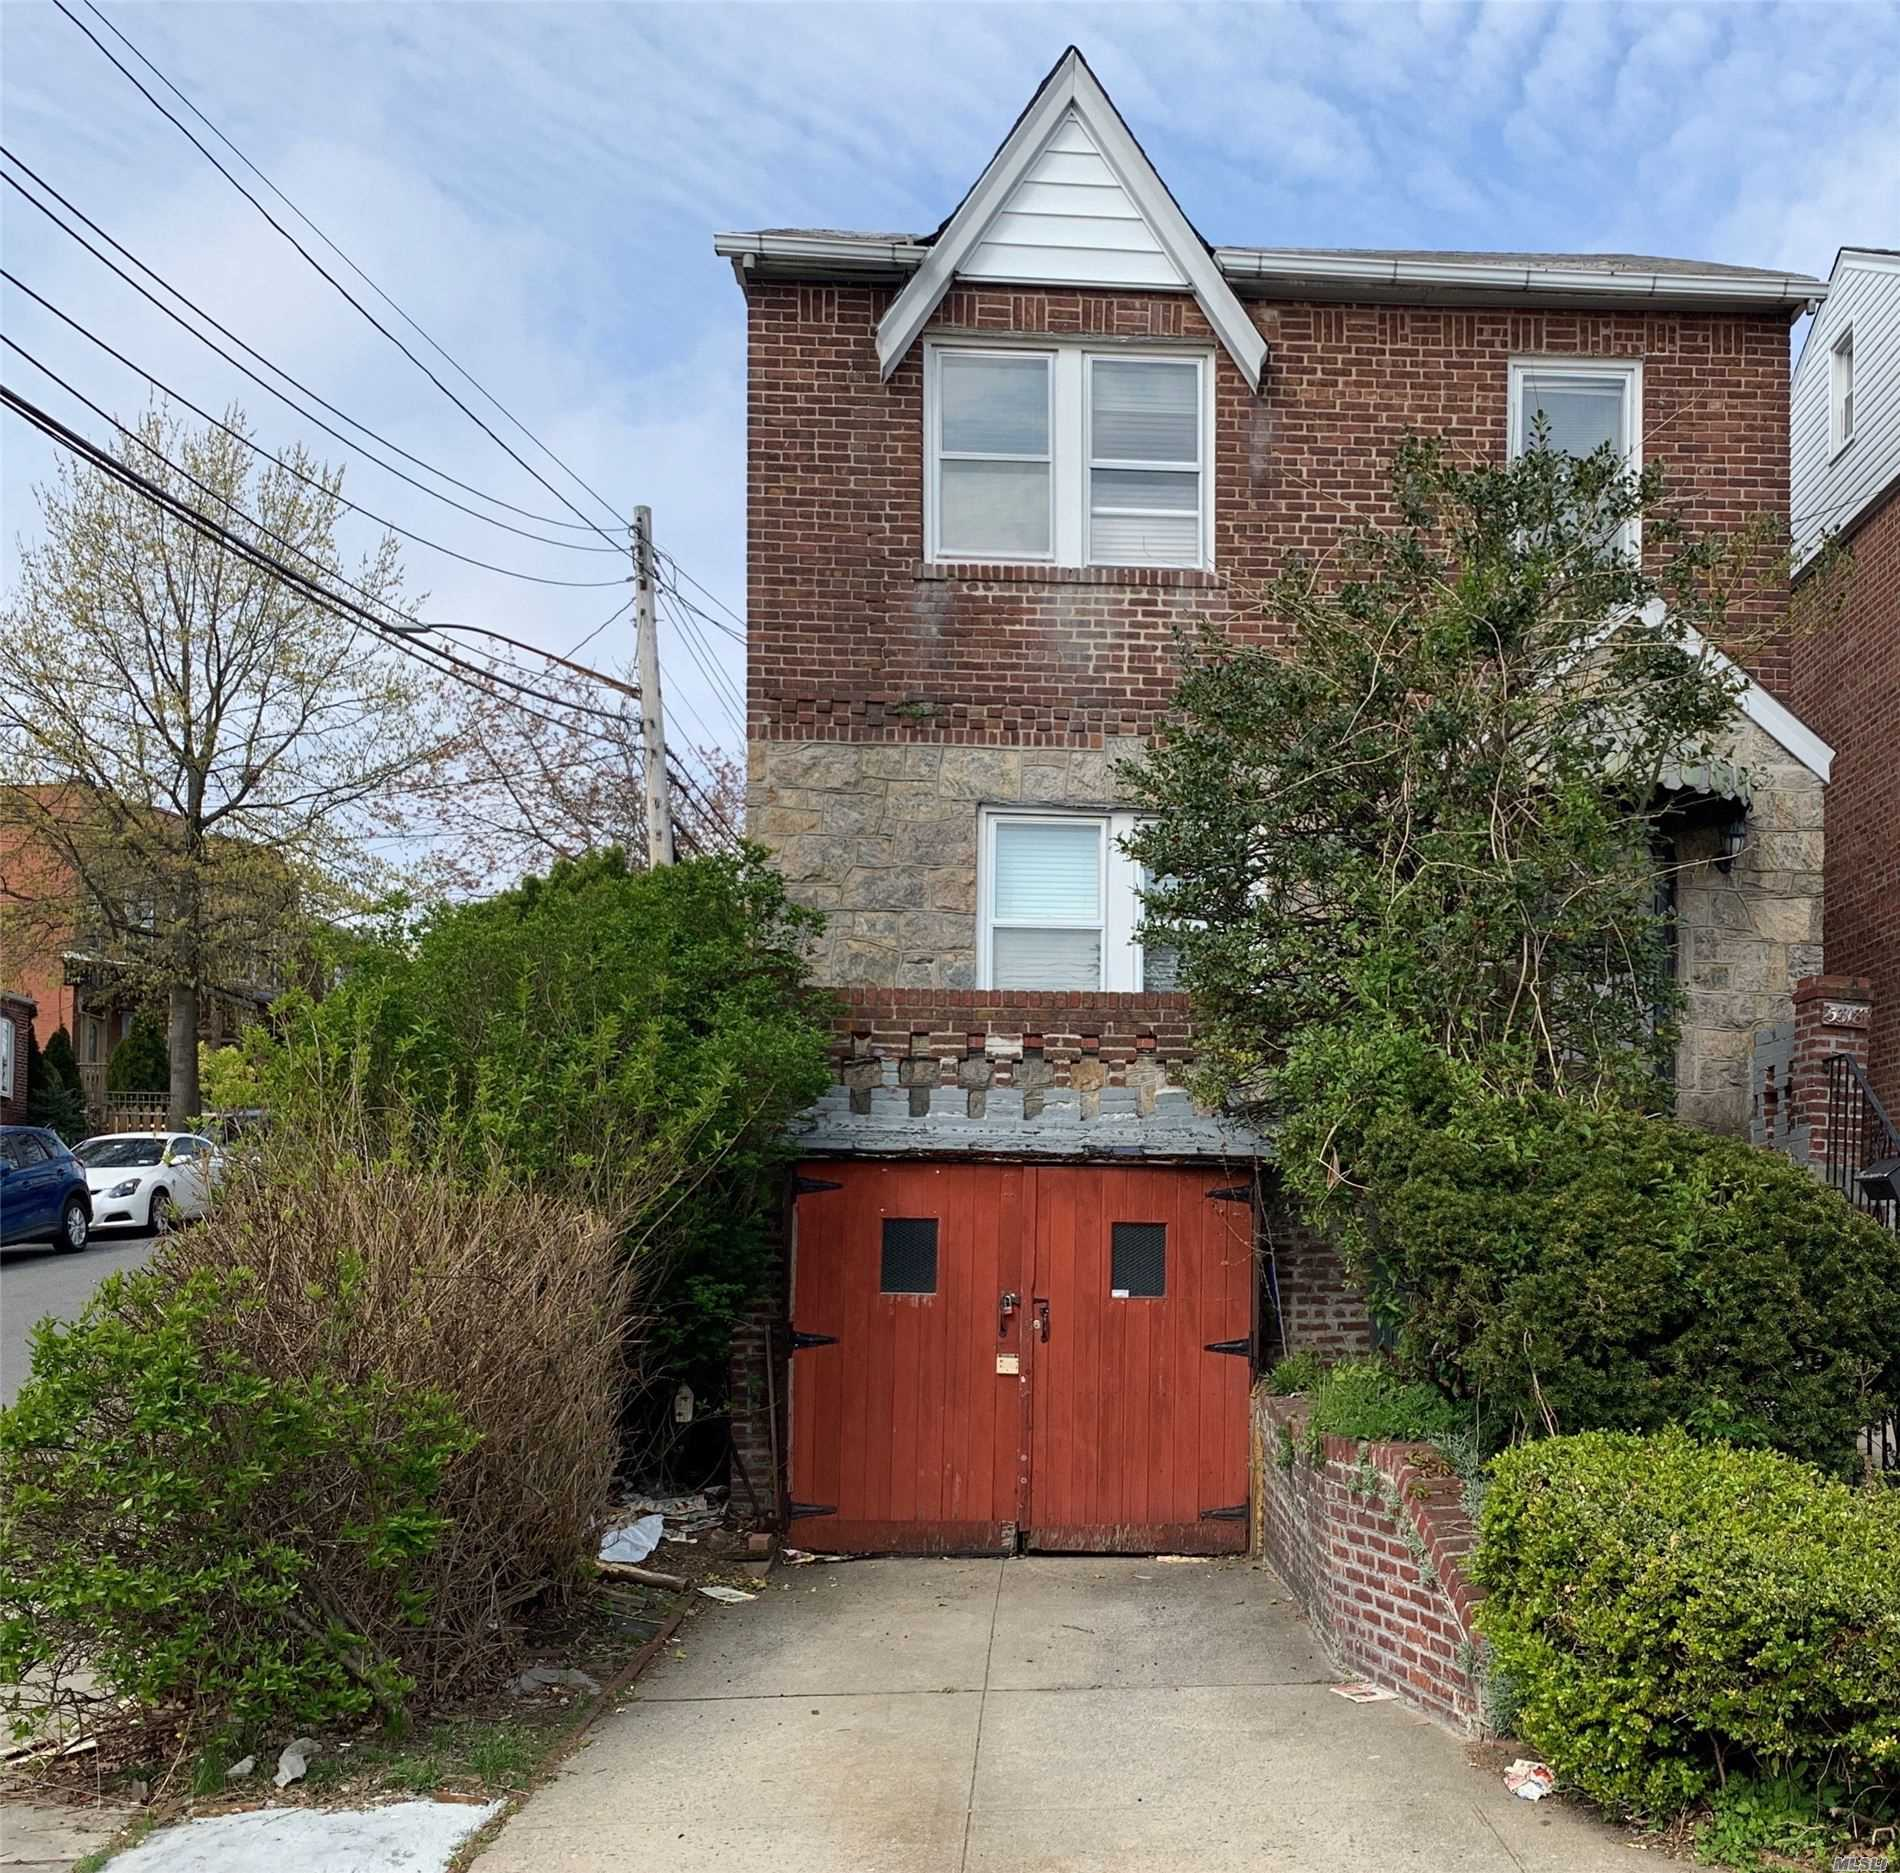 Property for sale at 53-18 69th Street, Maspeth NY 11378, Maspeth,  New York 11378